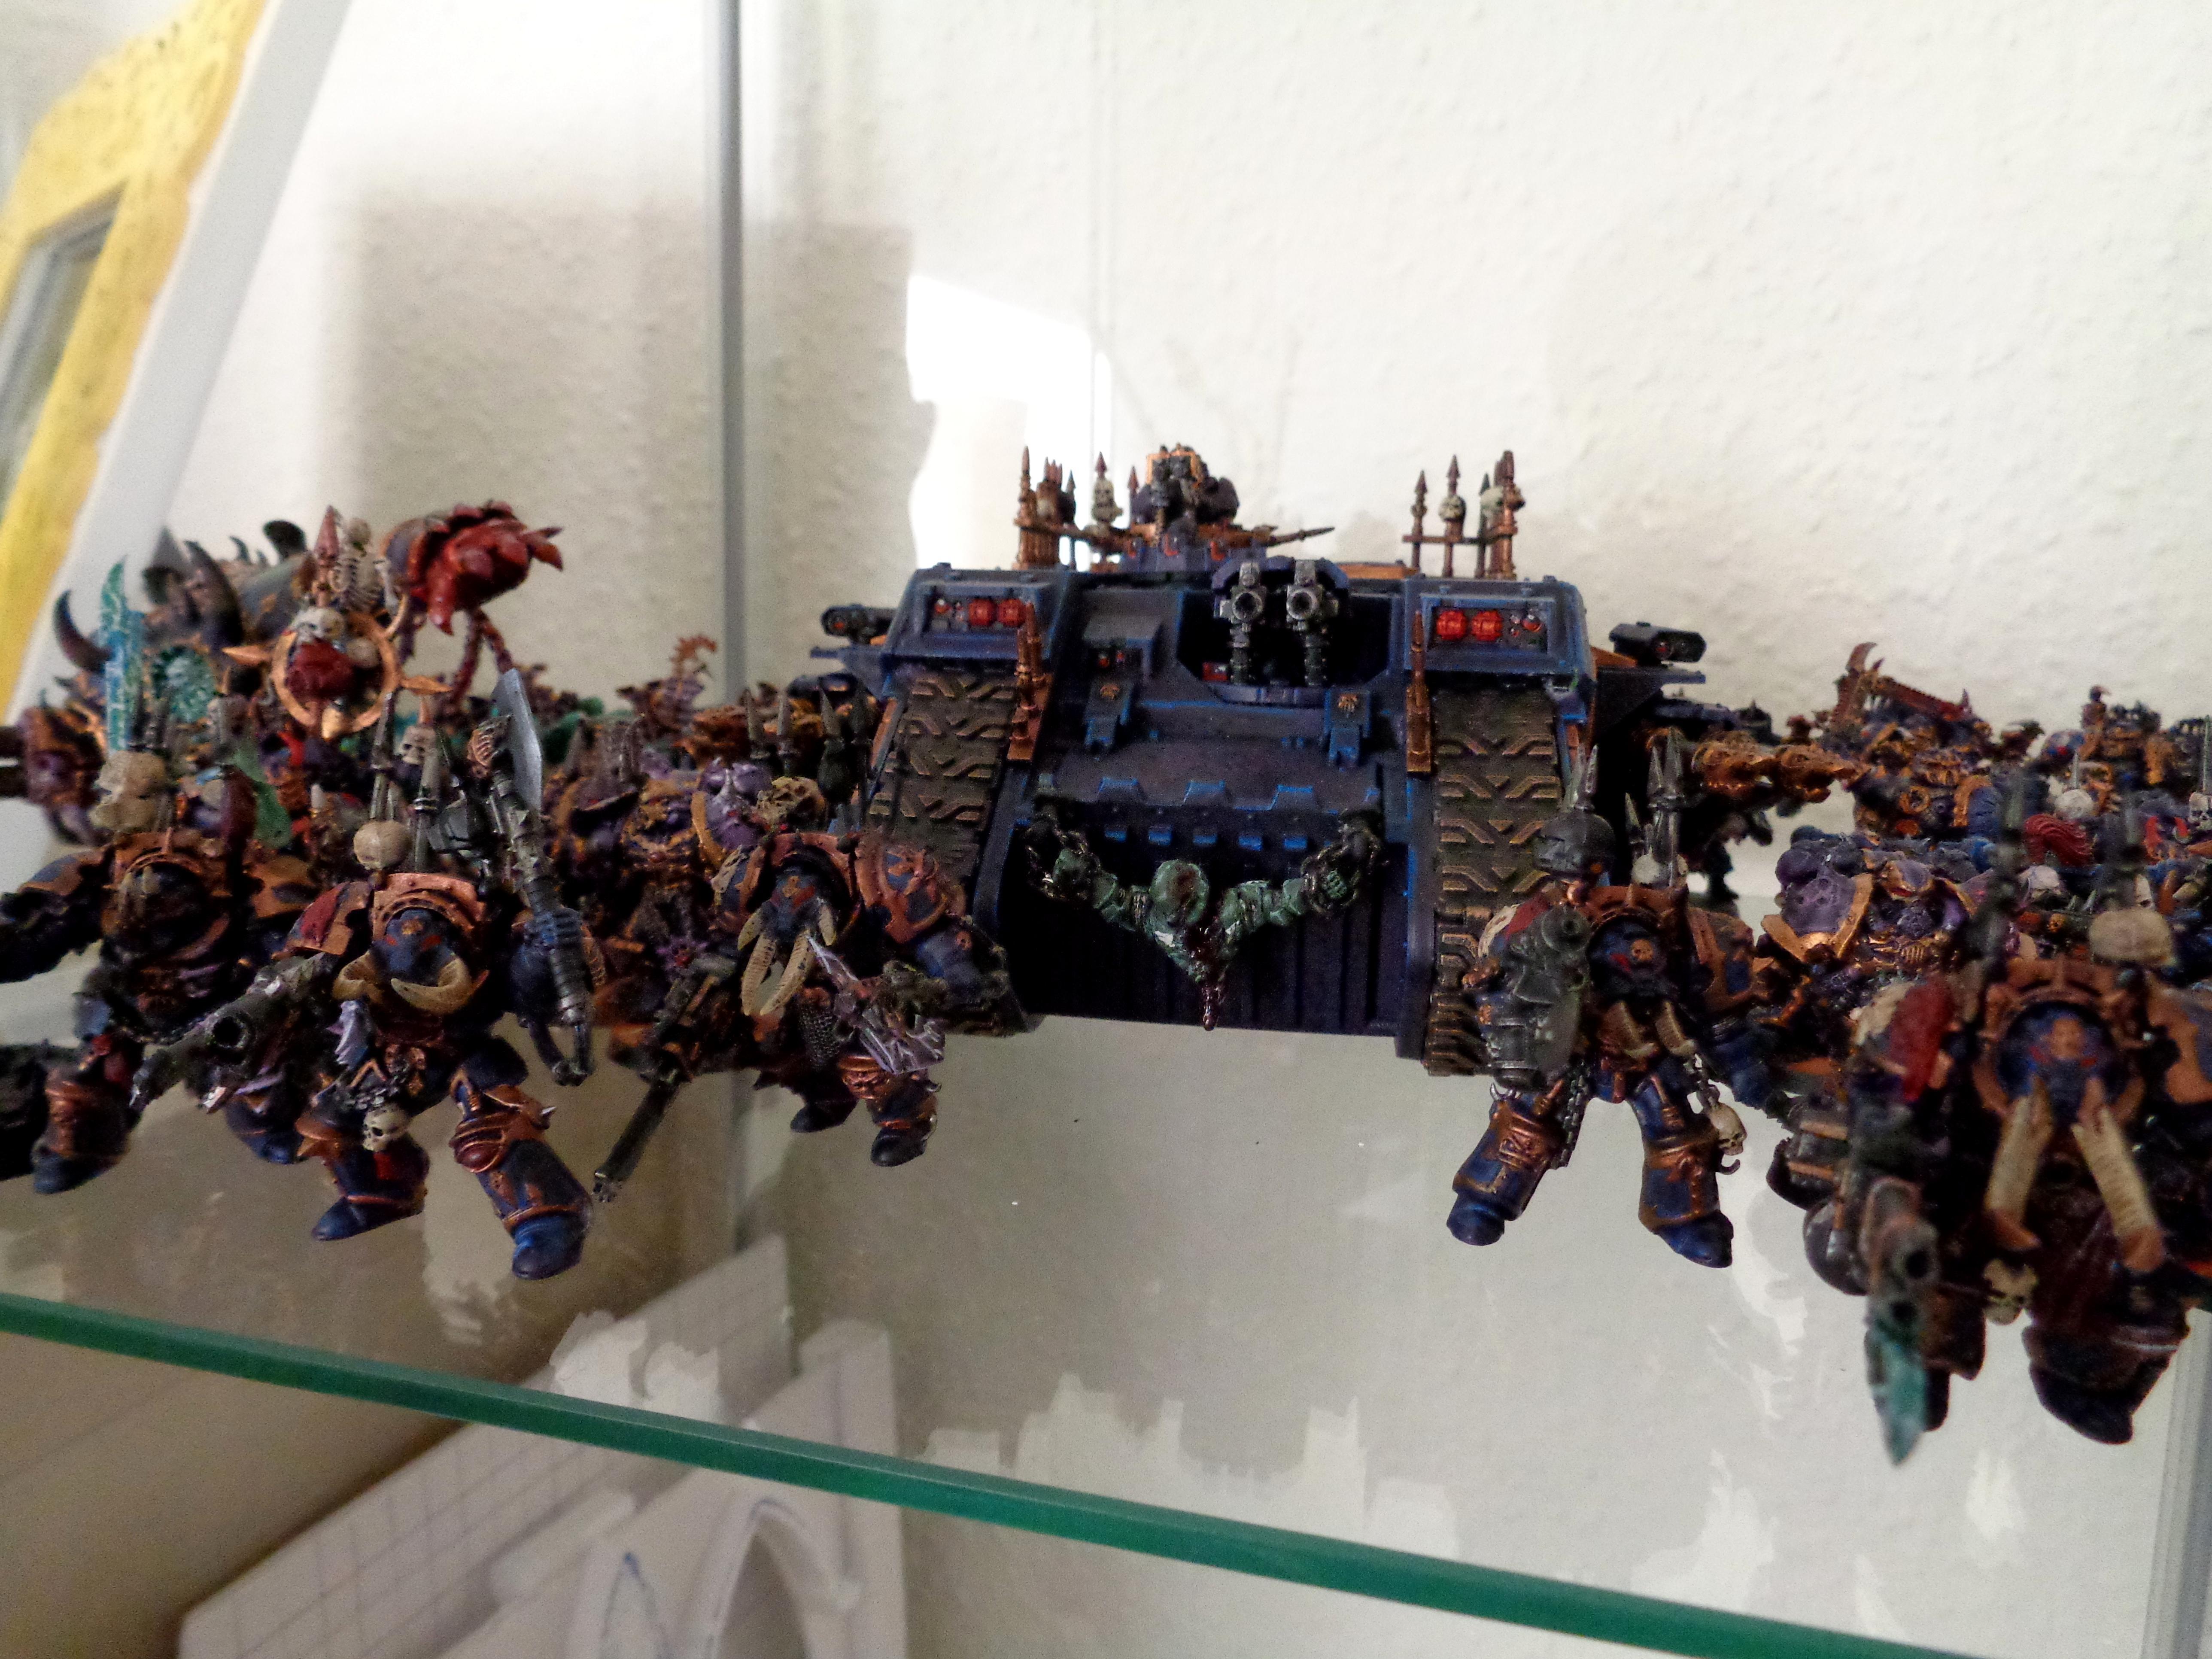 Chaos Space Marines, Land Raider, Night Lords, Source Lighting, Terminator Armor, Warhammer 40,000, Work In Progress